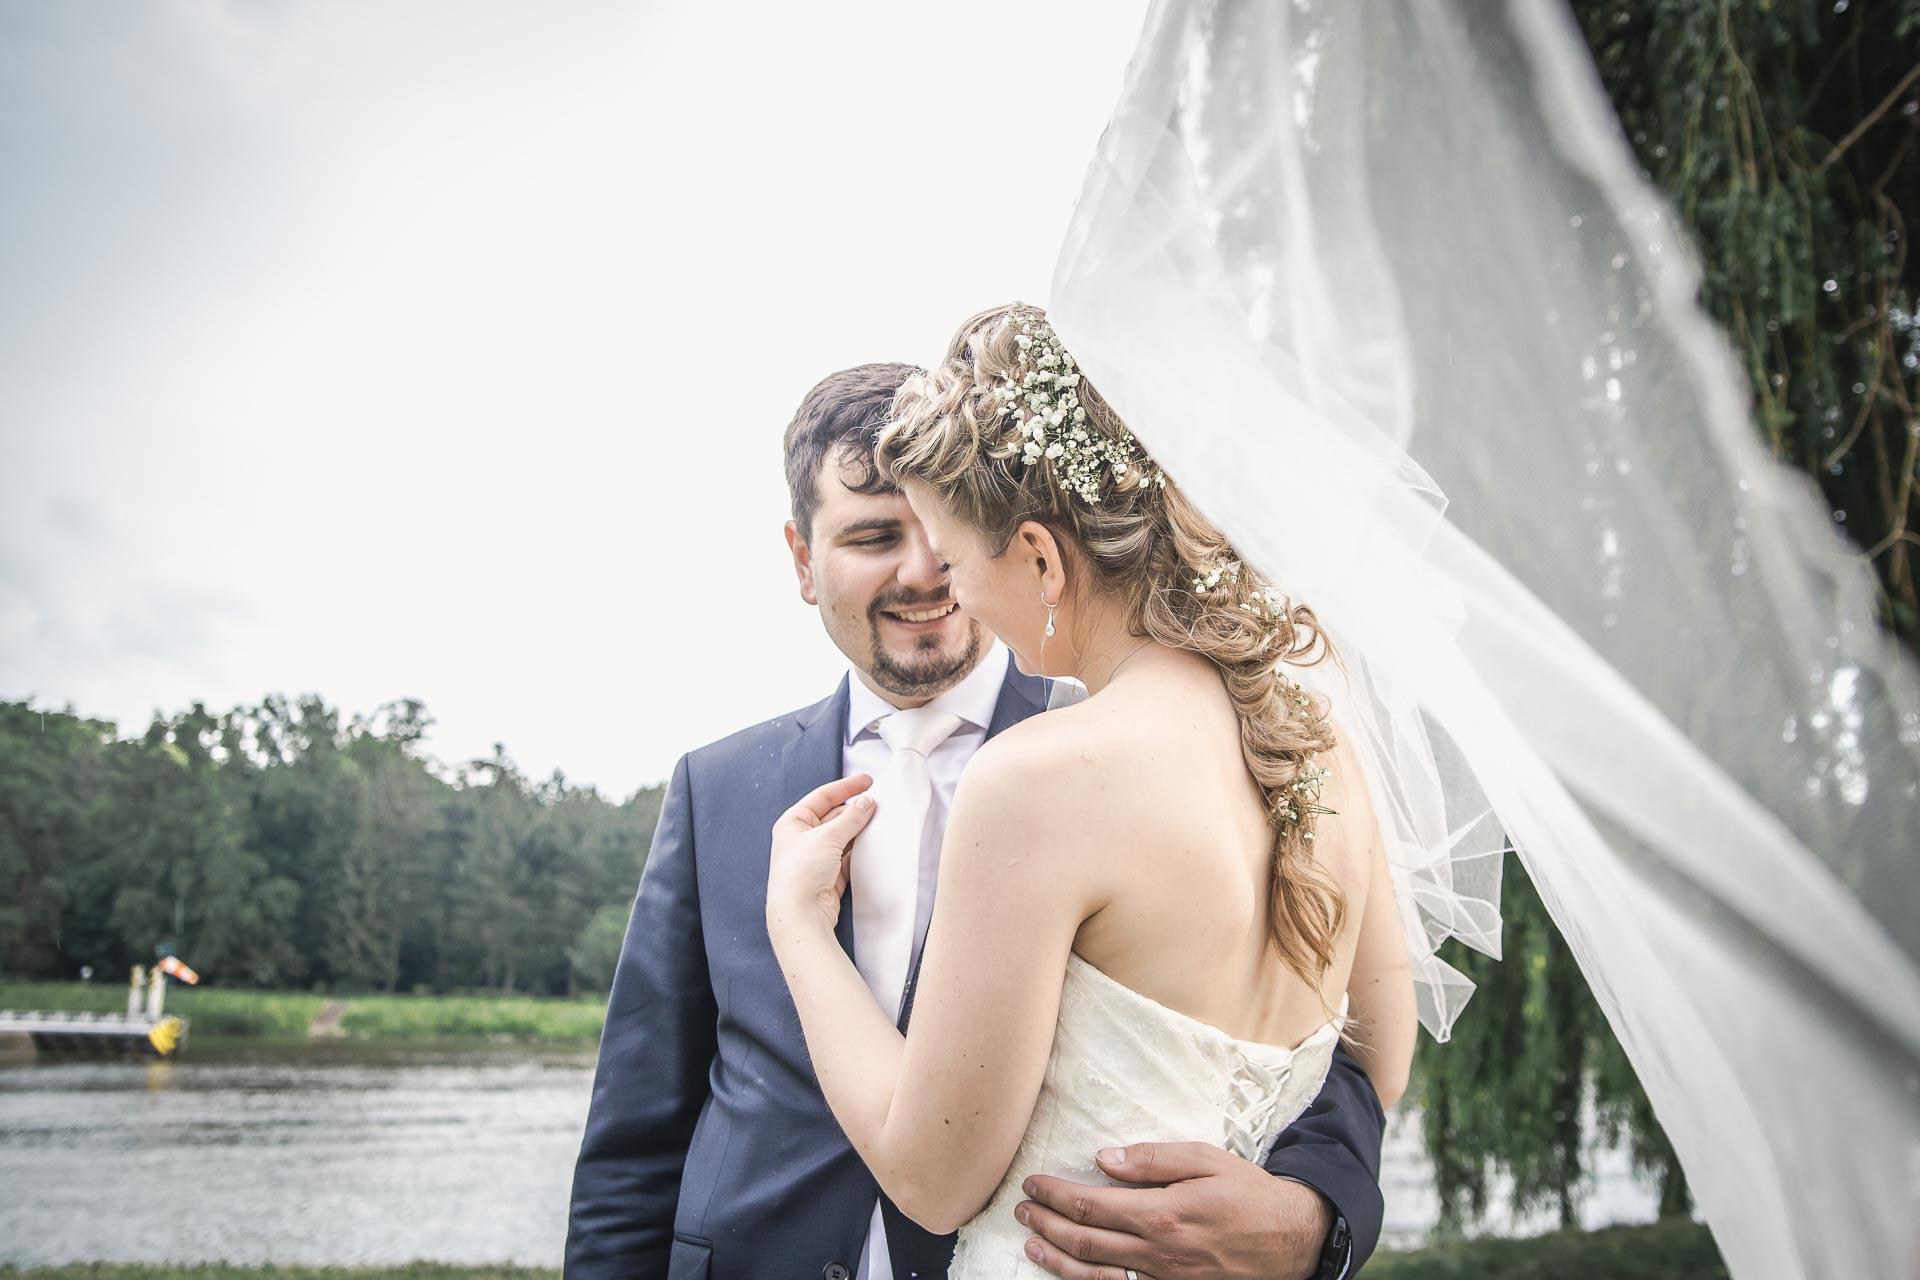 Svatební-fotograf-Nymburk-6304